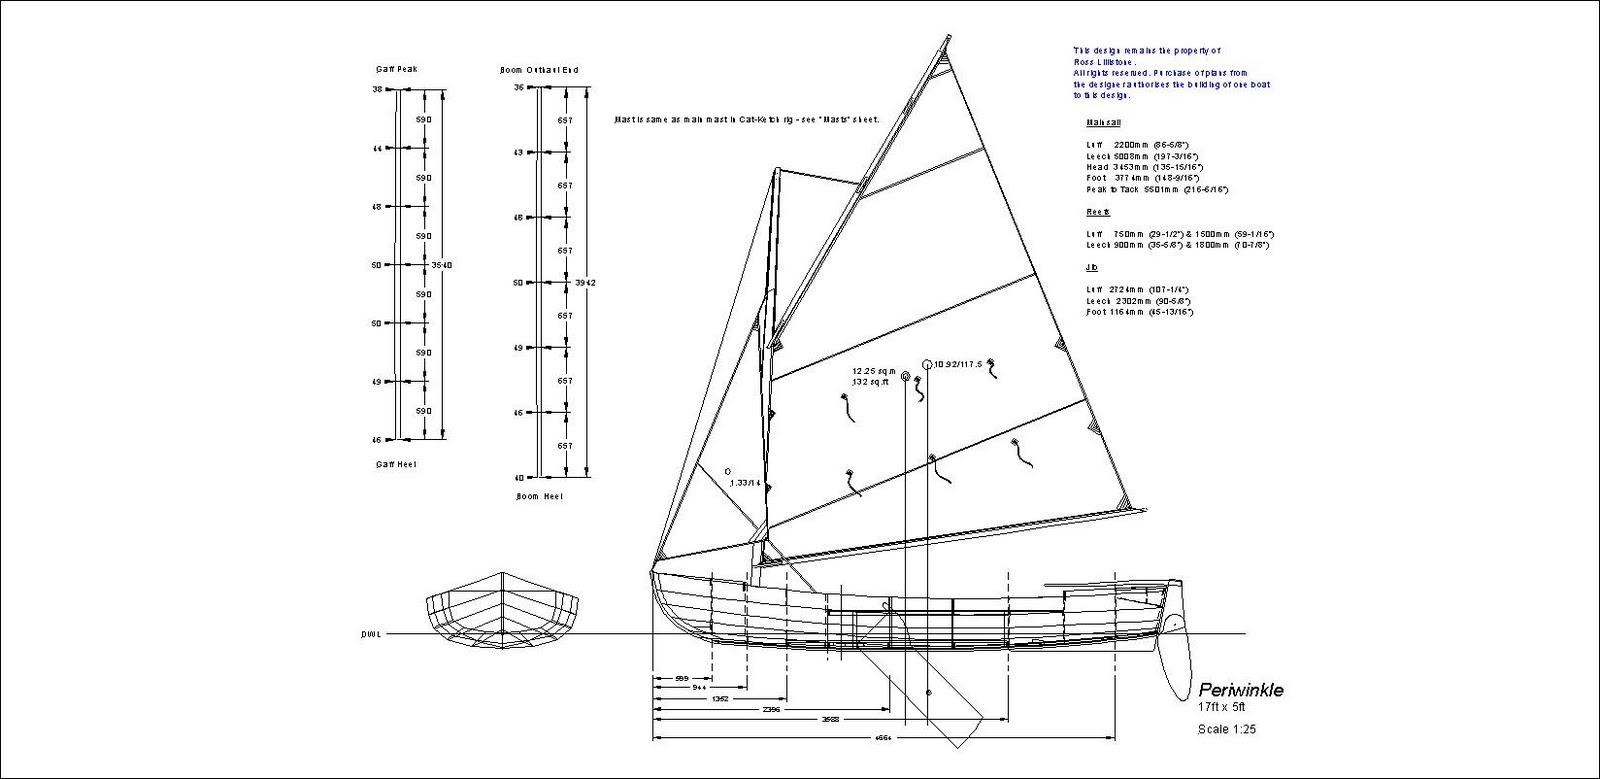 Ross Lillistone Wooden Boats February